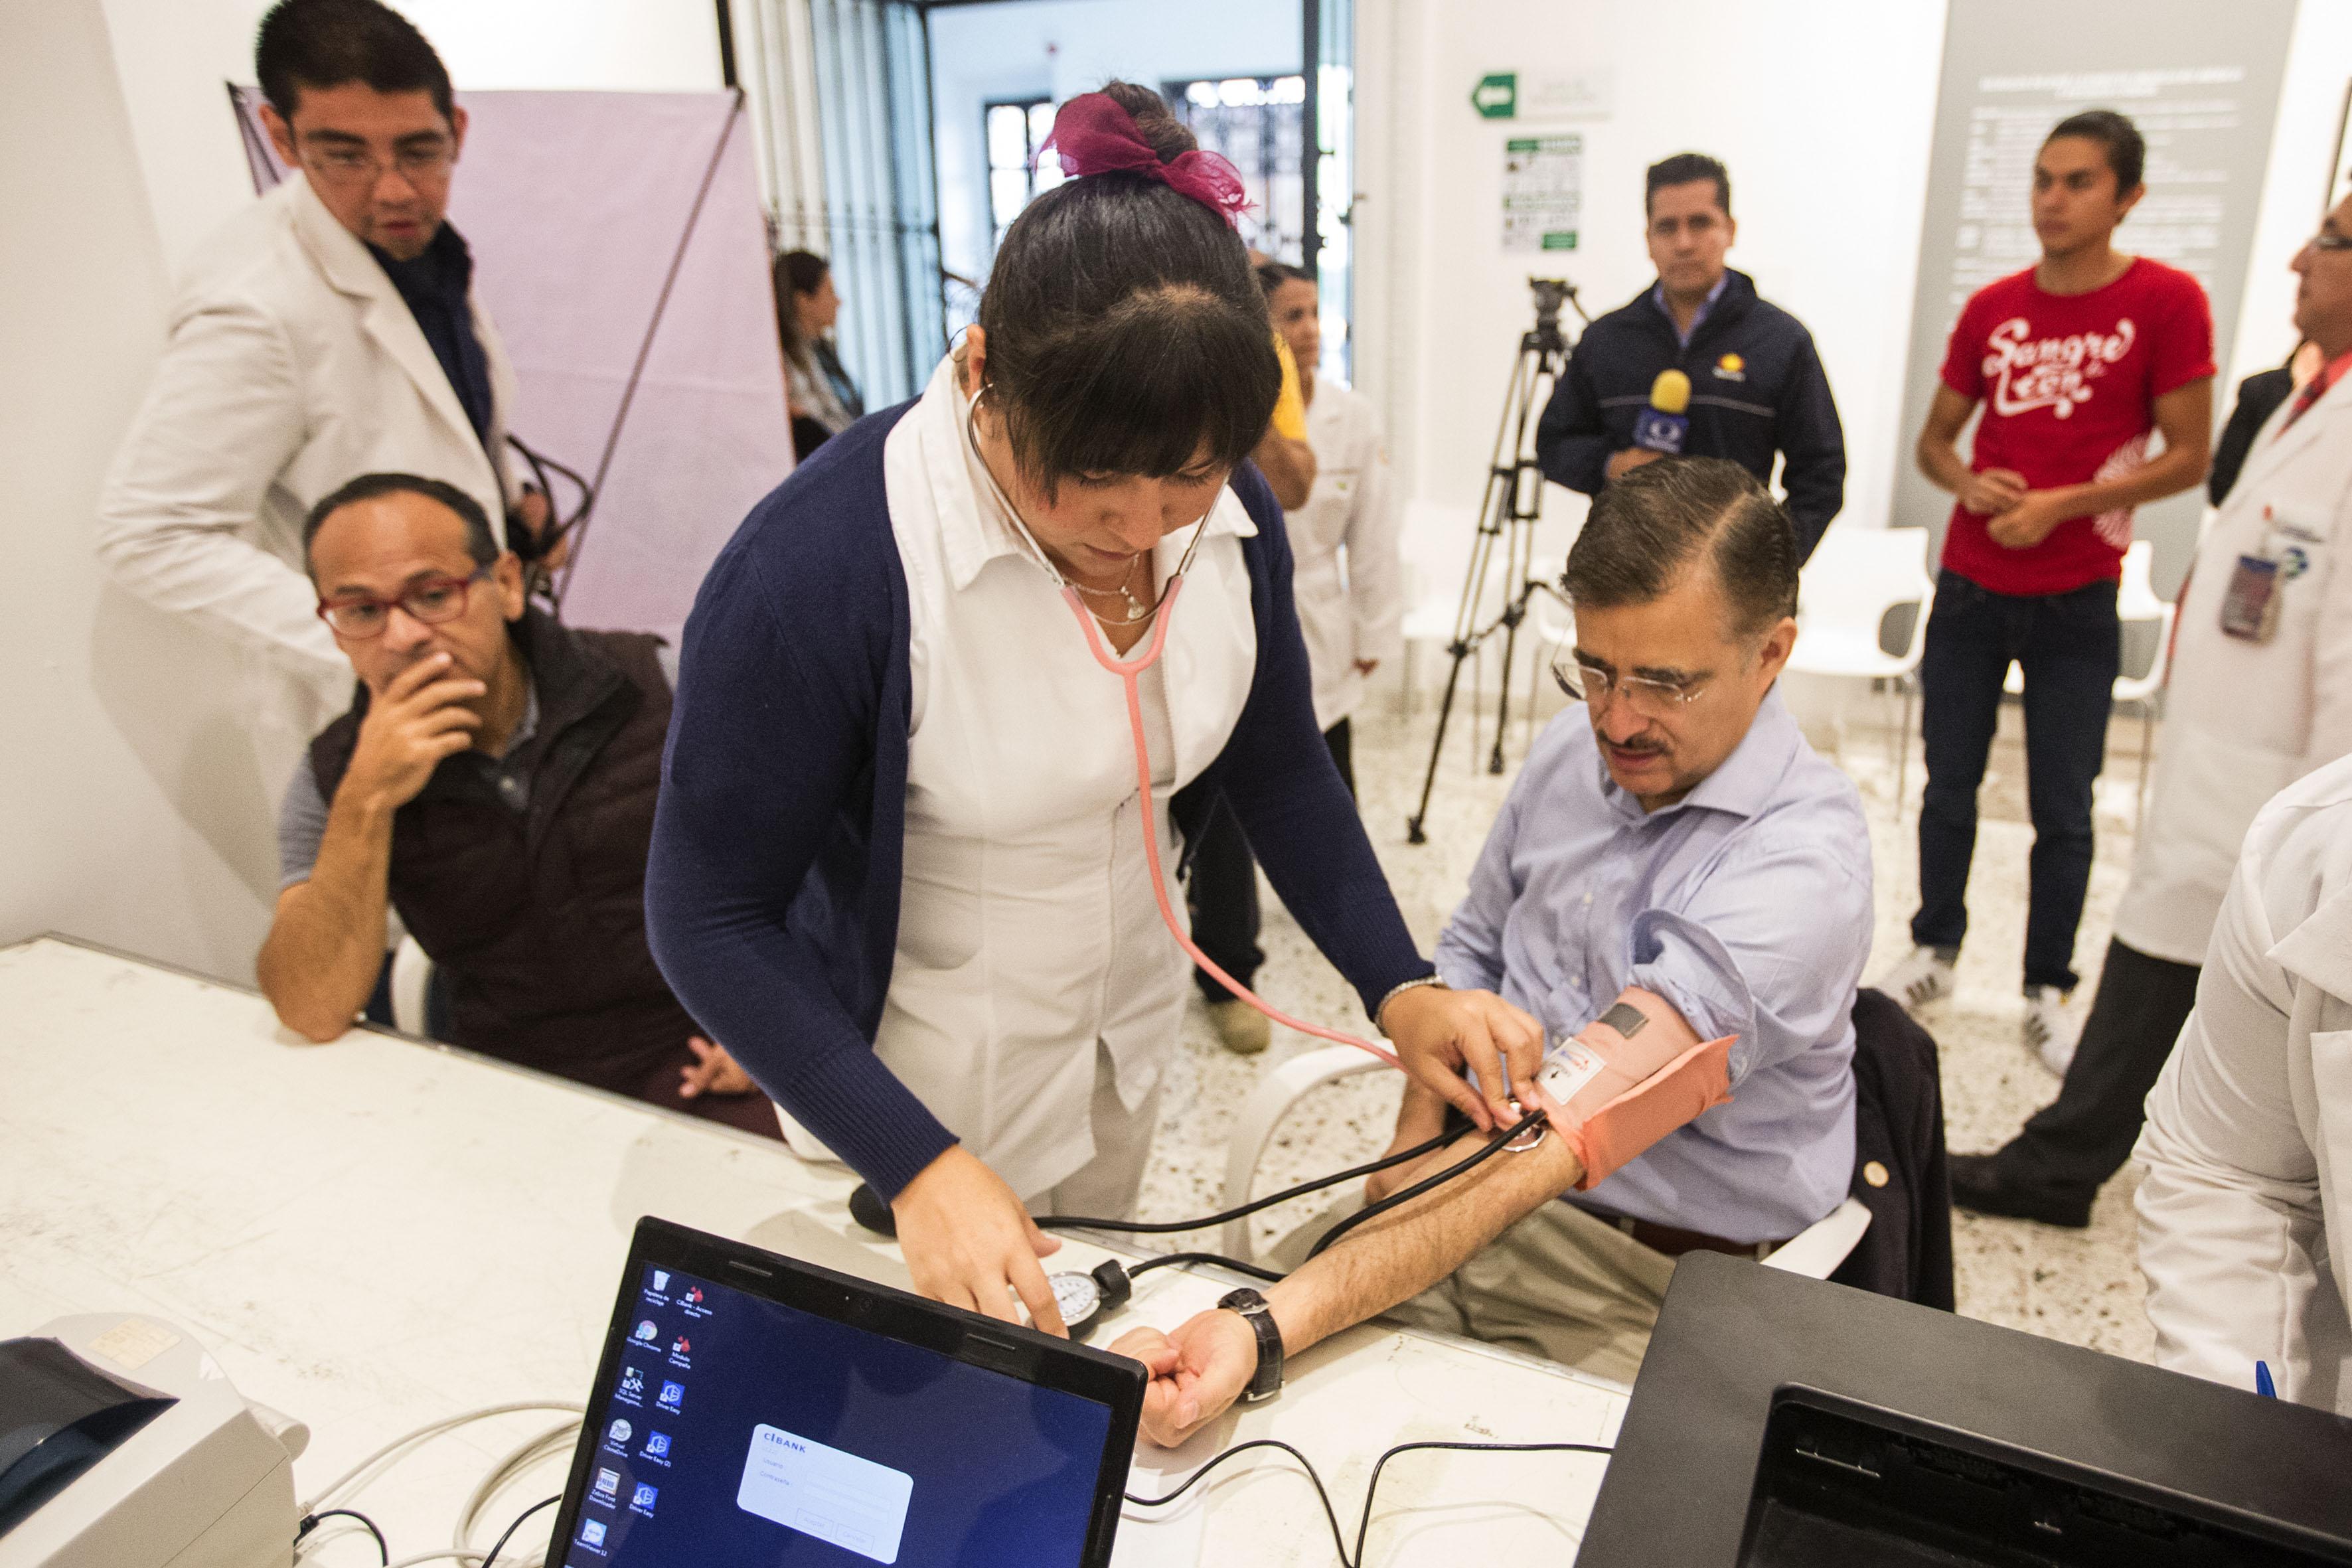 Enfermera tomando signos vitales al Rector General de la Universidad de Guadalajara (UdeG), maestro Itzcóatl Tonatiuh Bravo Padilla